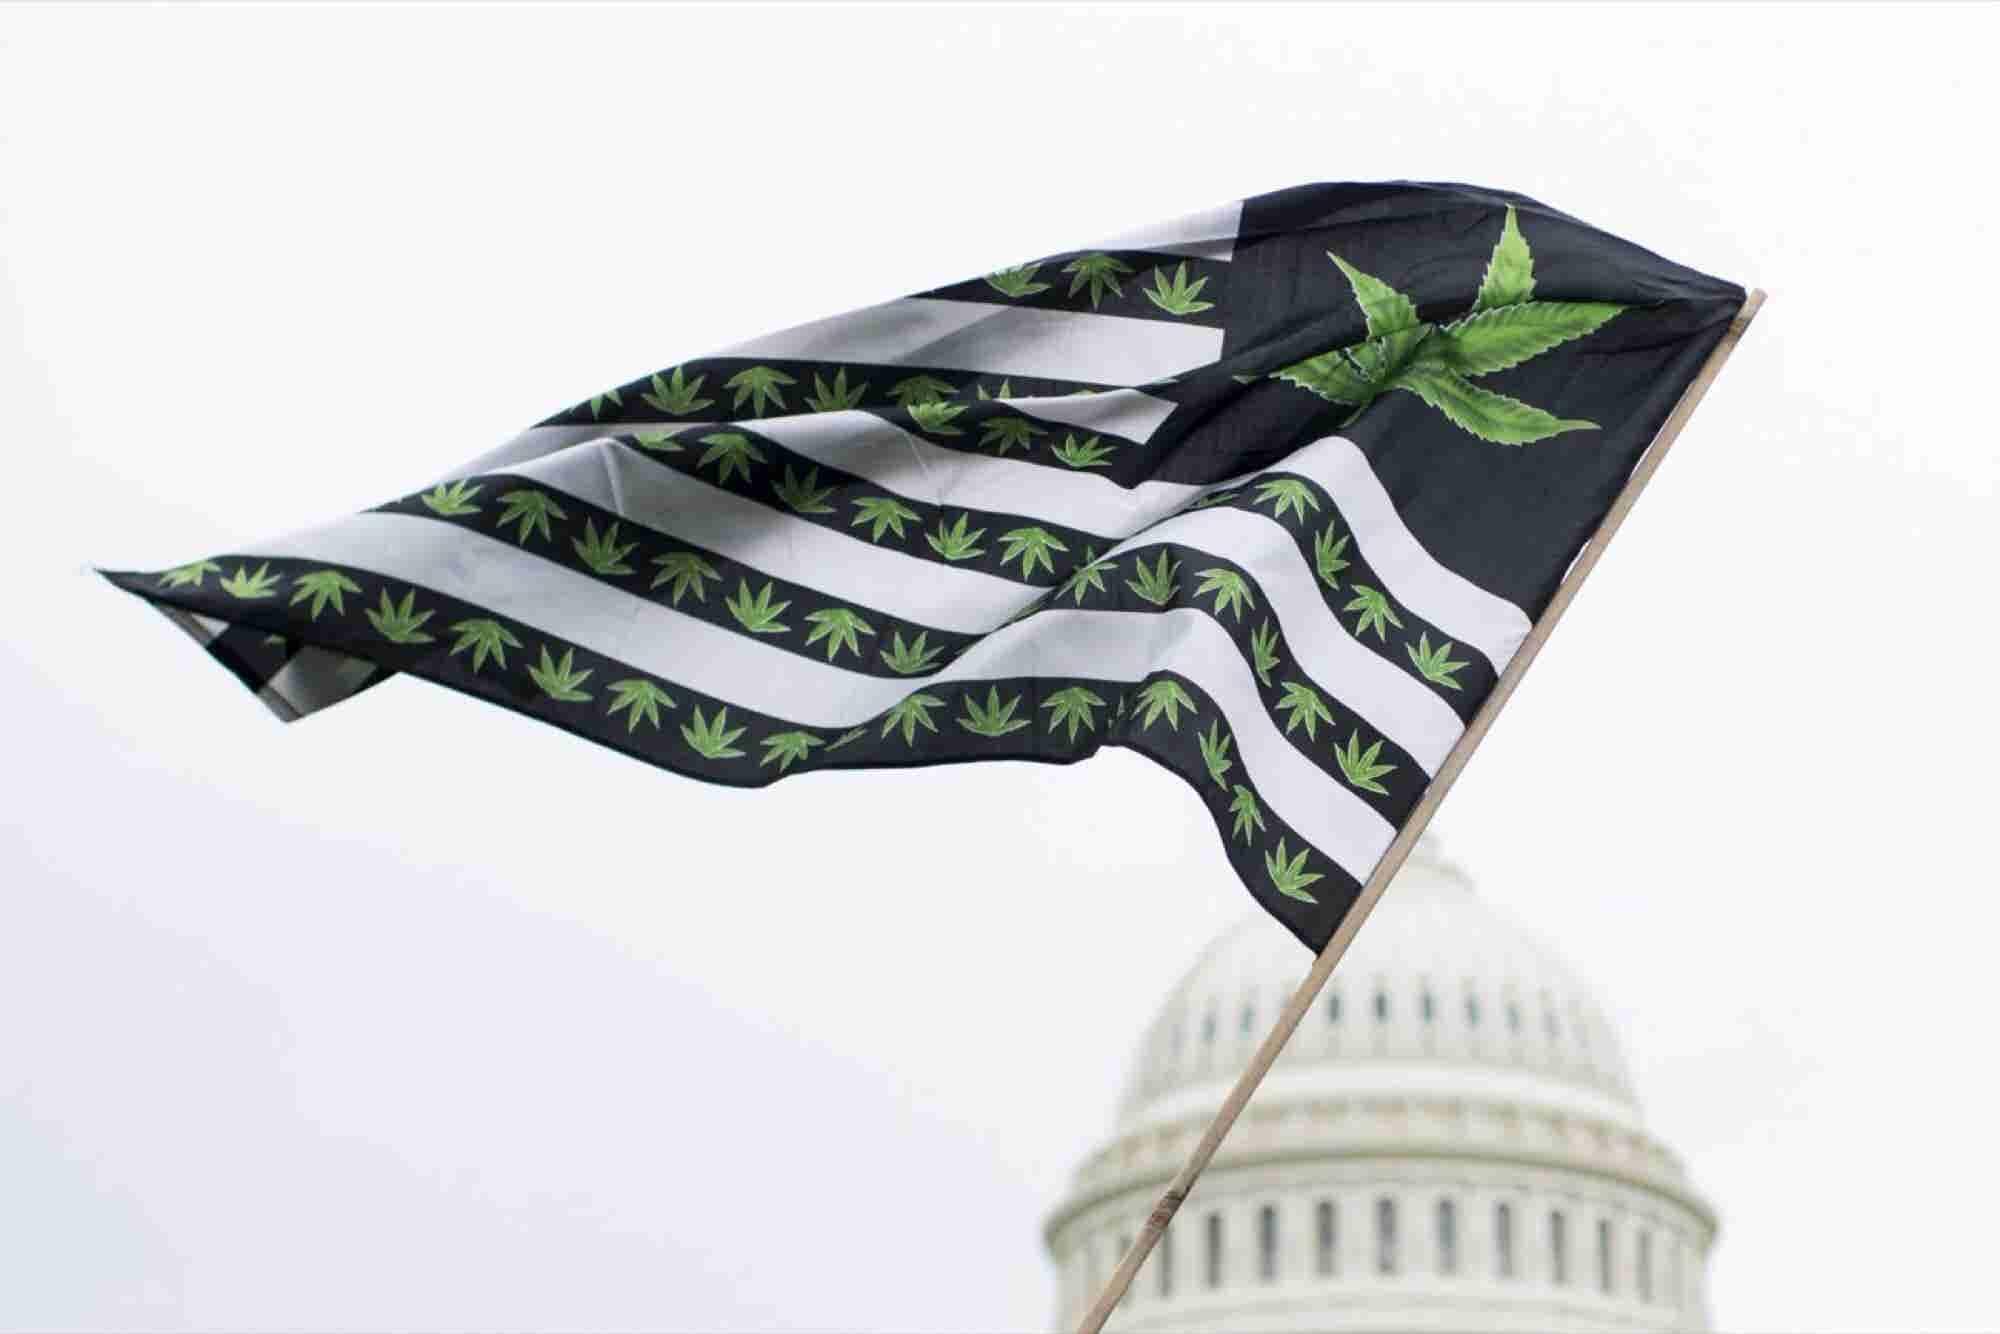 Legal Marijuana Just Can't Catch a Break From Washington